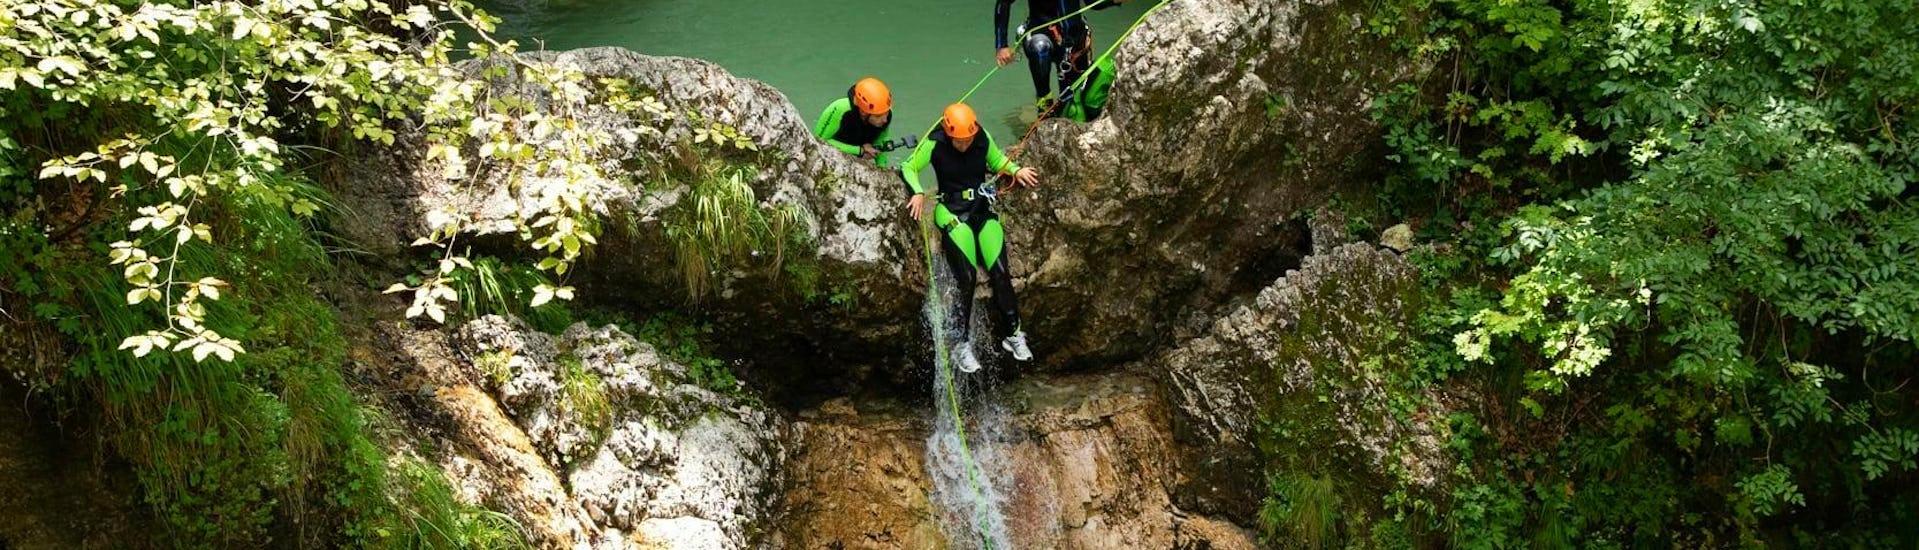 canyoning-adrenaline-fratarica-natures-ways-bovec-hero